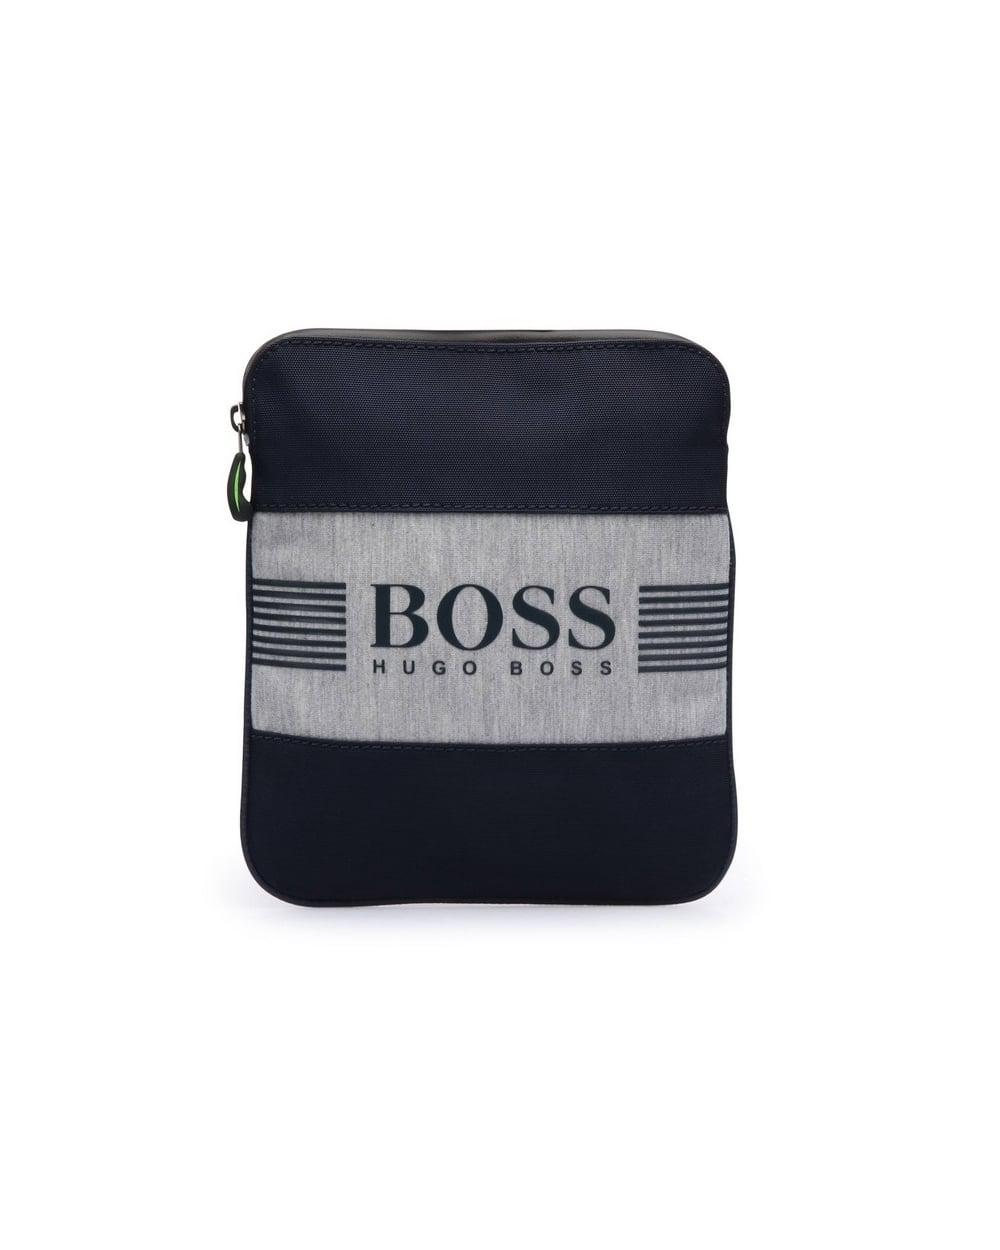 739848d4cdf1 Lyst - BOSS Pixel Js Zip Env Navy Blue Stash Bag in Blue for Men